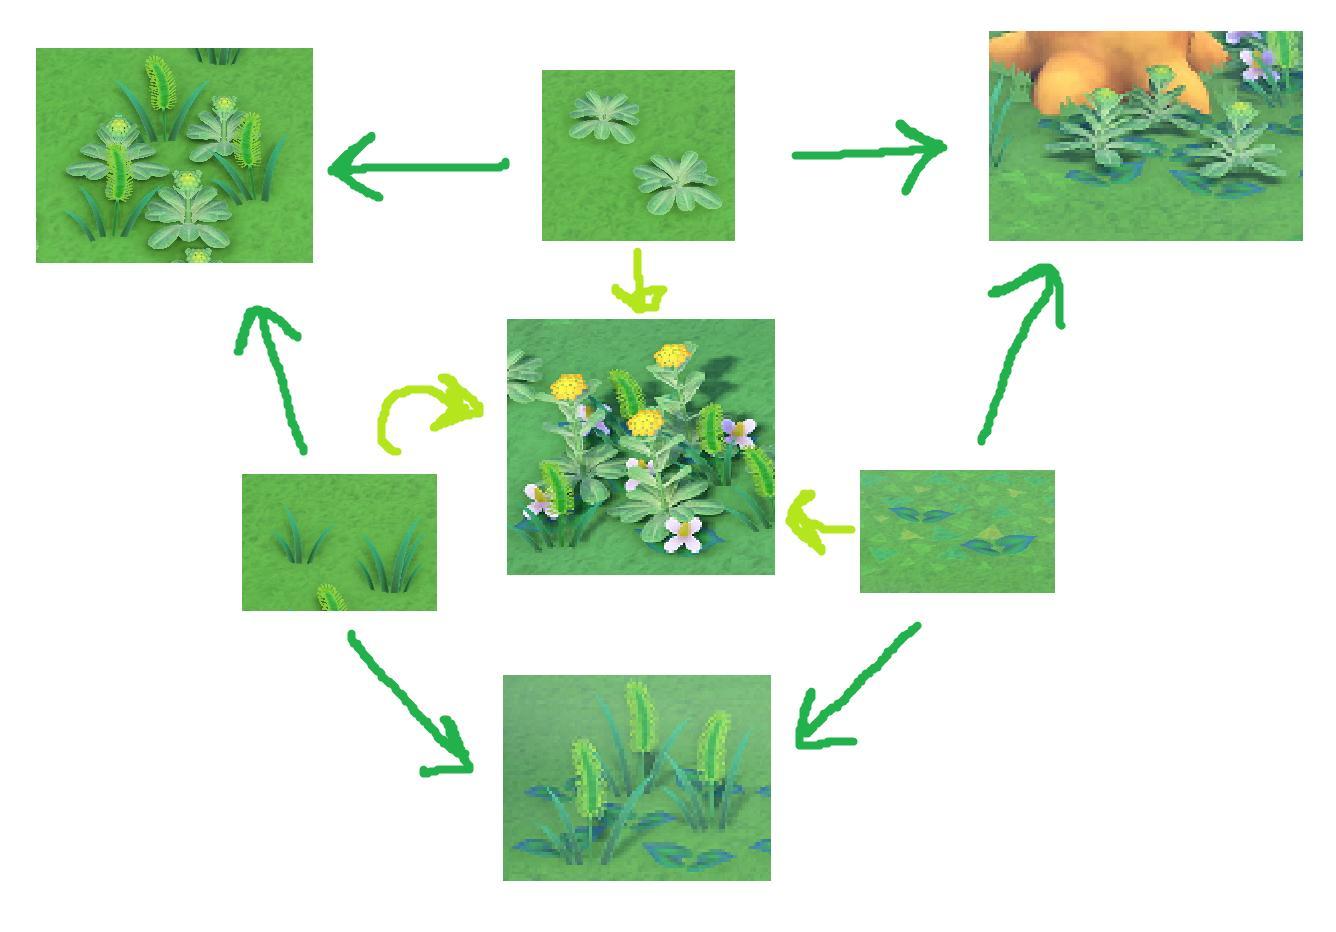 animal crossing new horizons pot leaf design